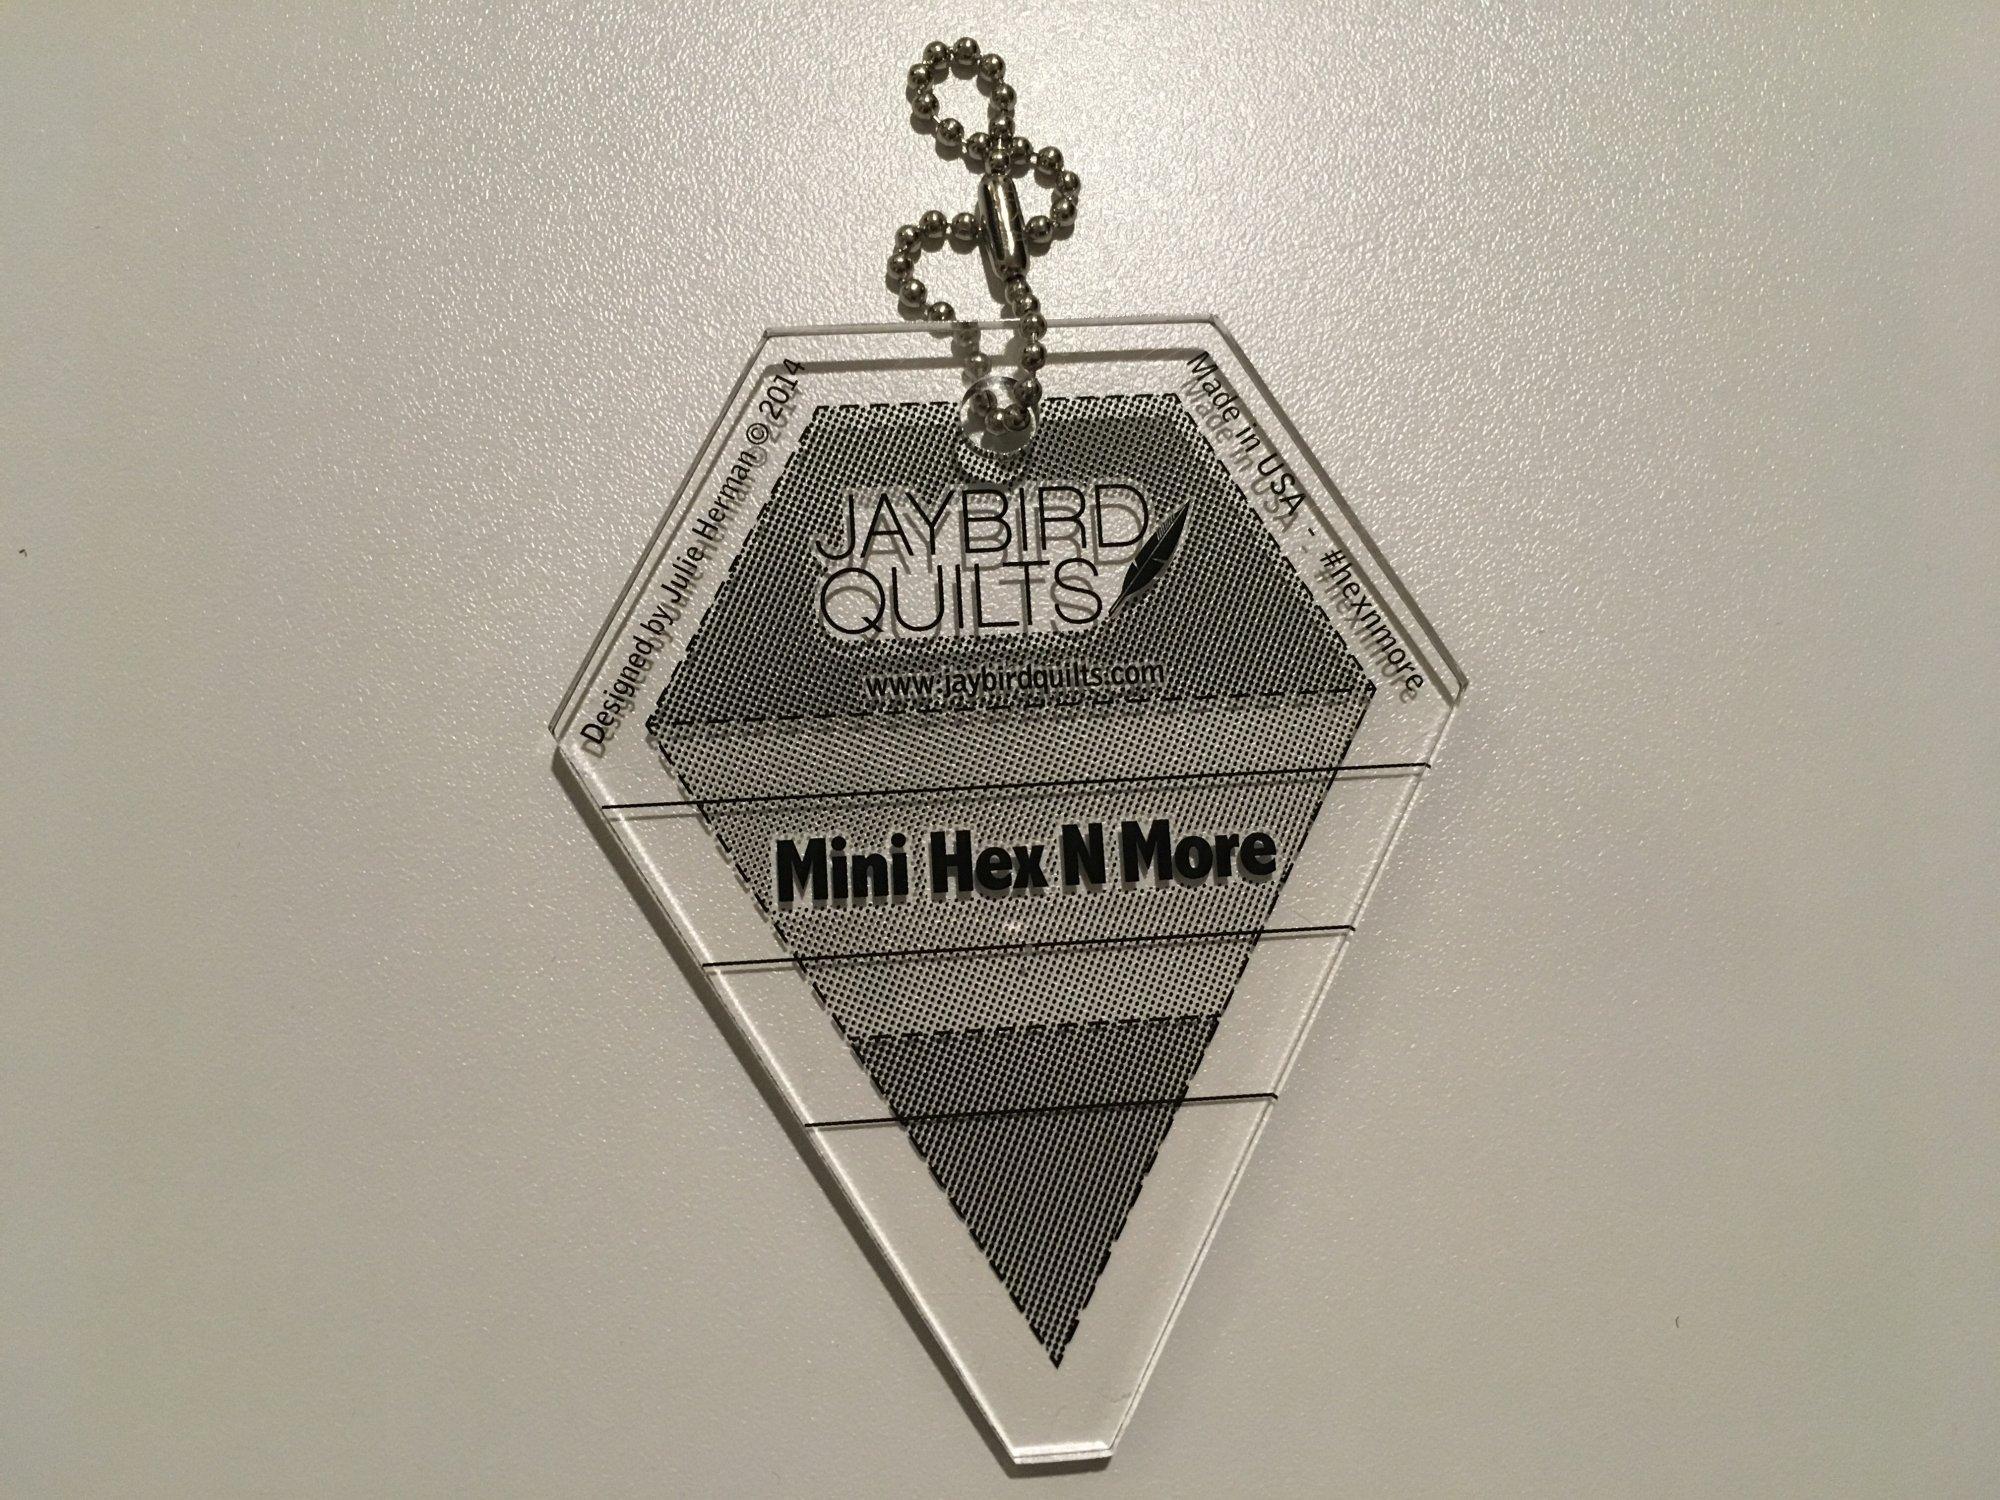 MINI HEX N MORE RULER by Jaybird Quilts JBQ203